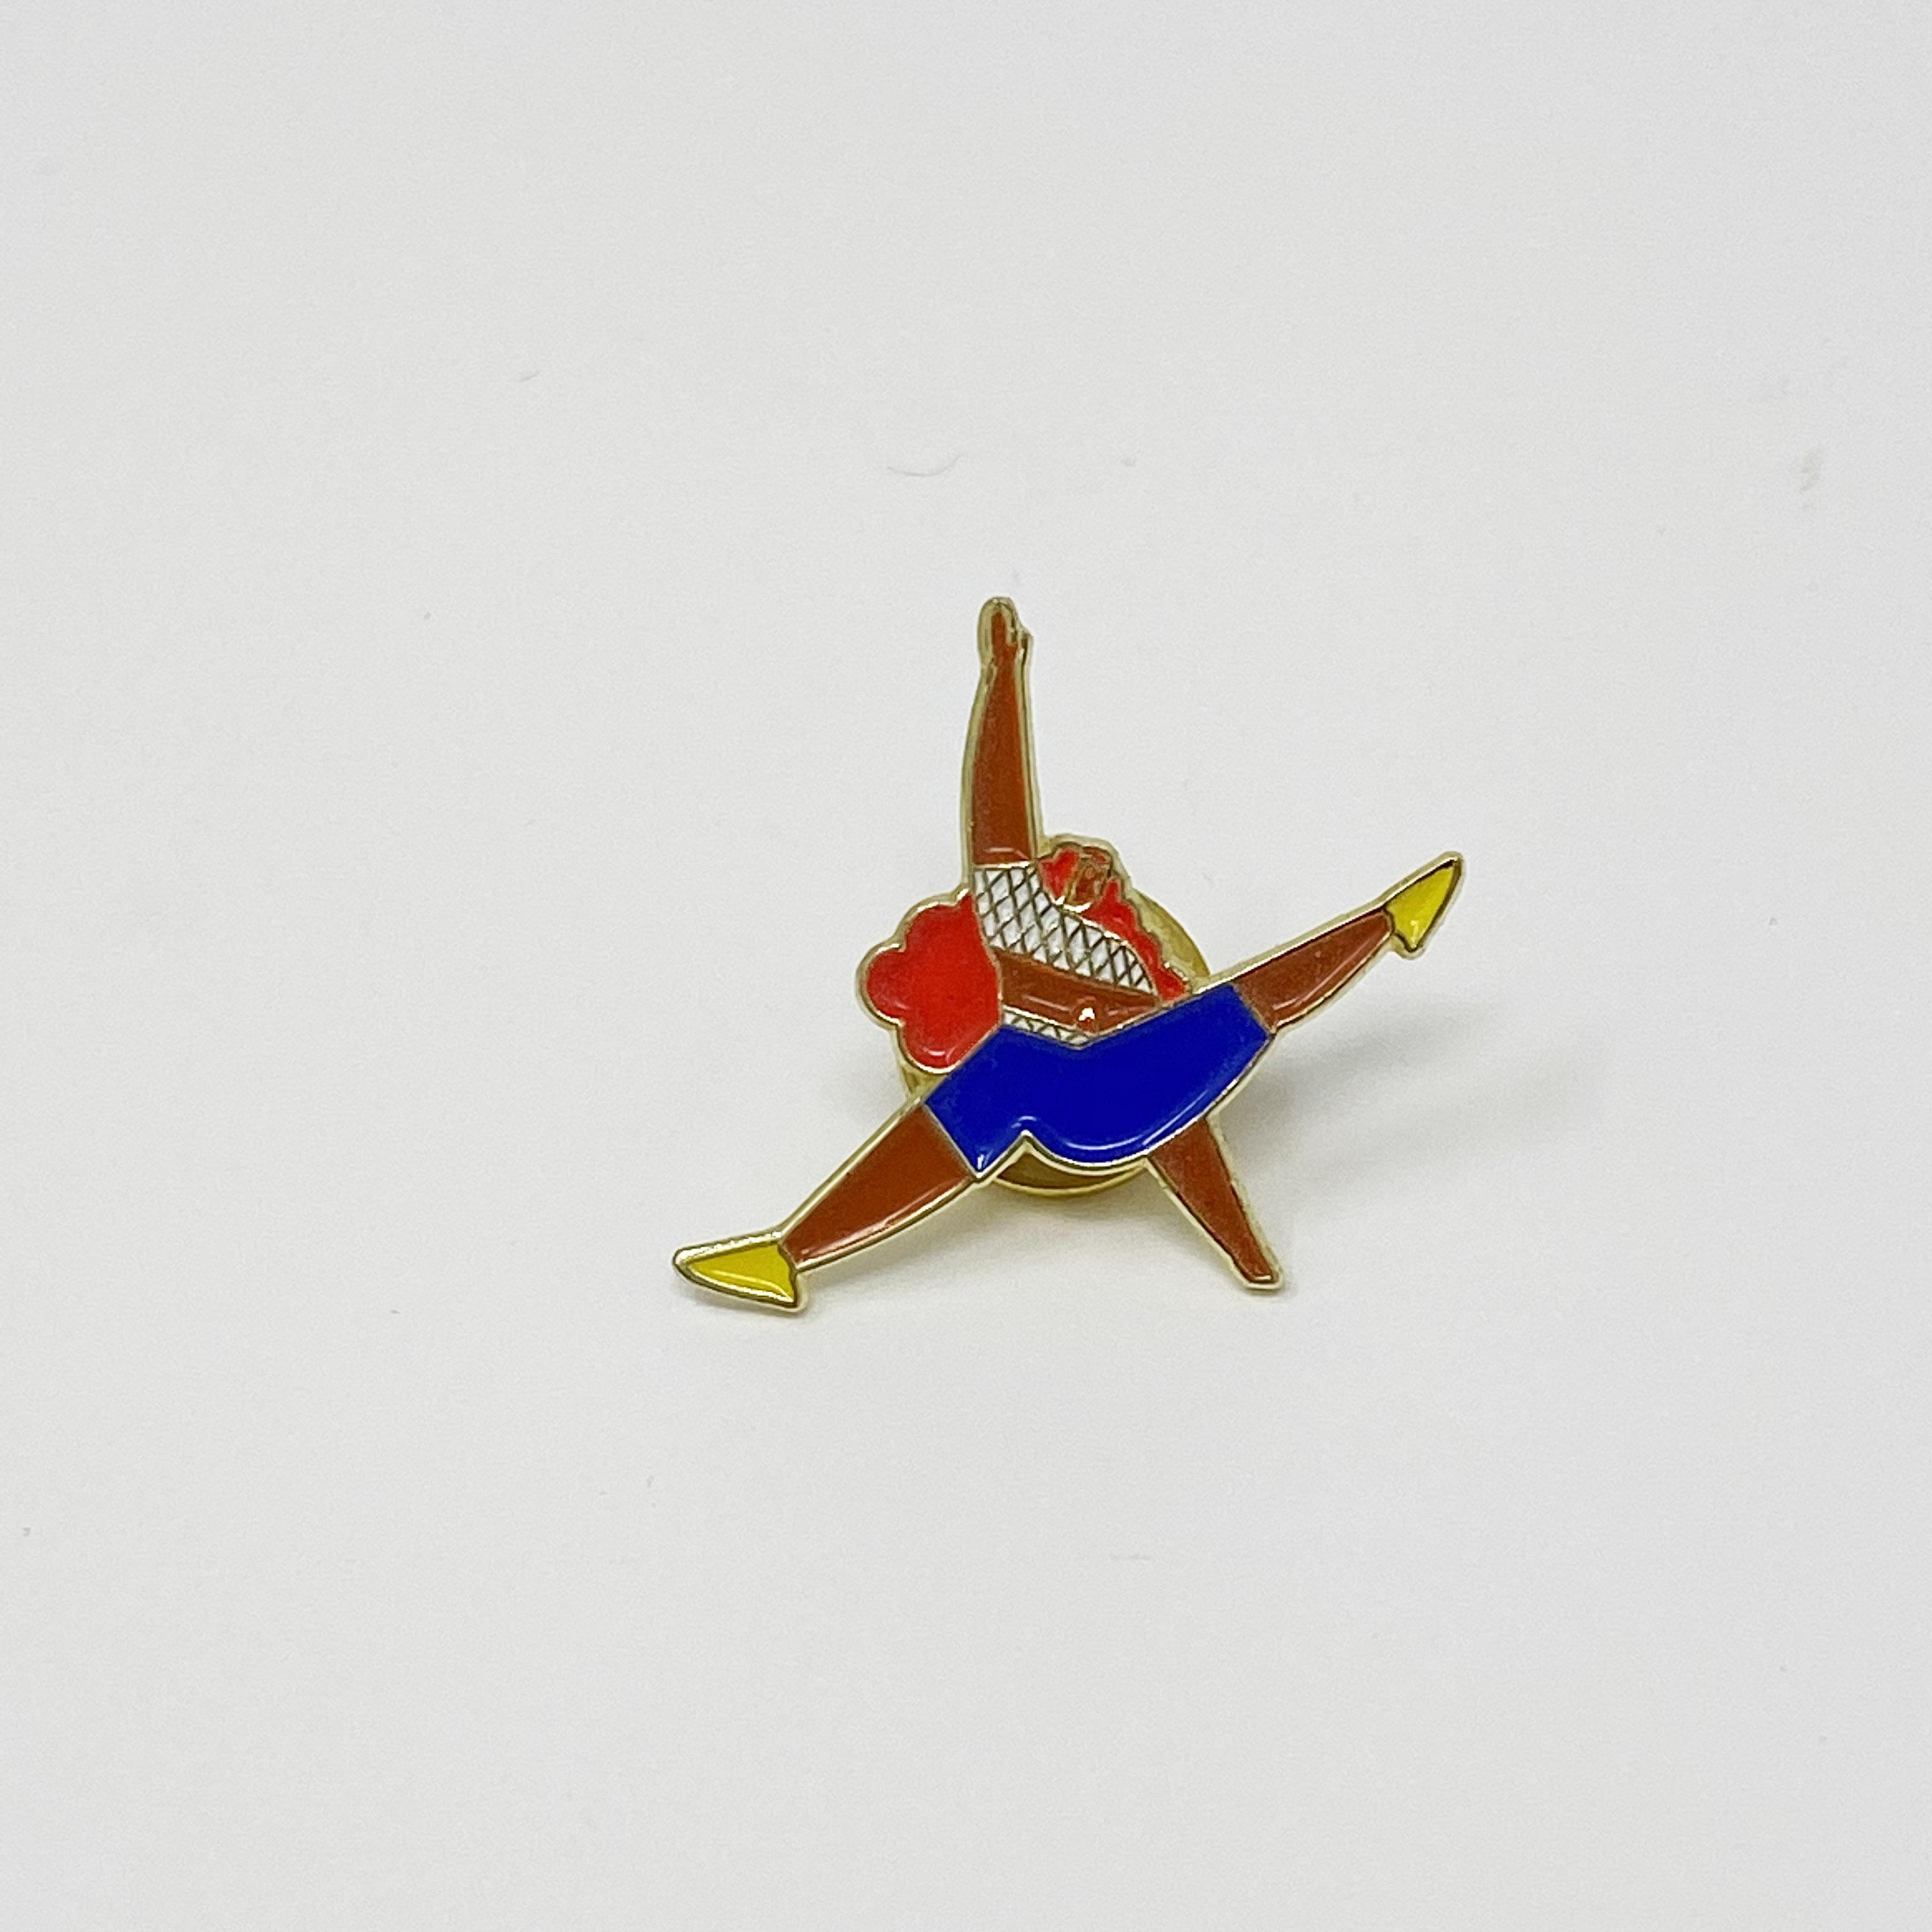 Tiny Dancer Enamel Pin Badge